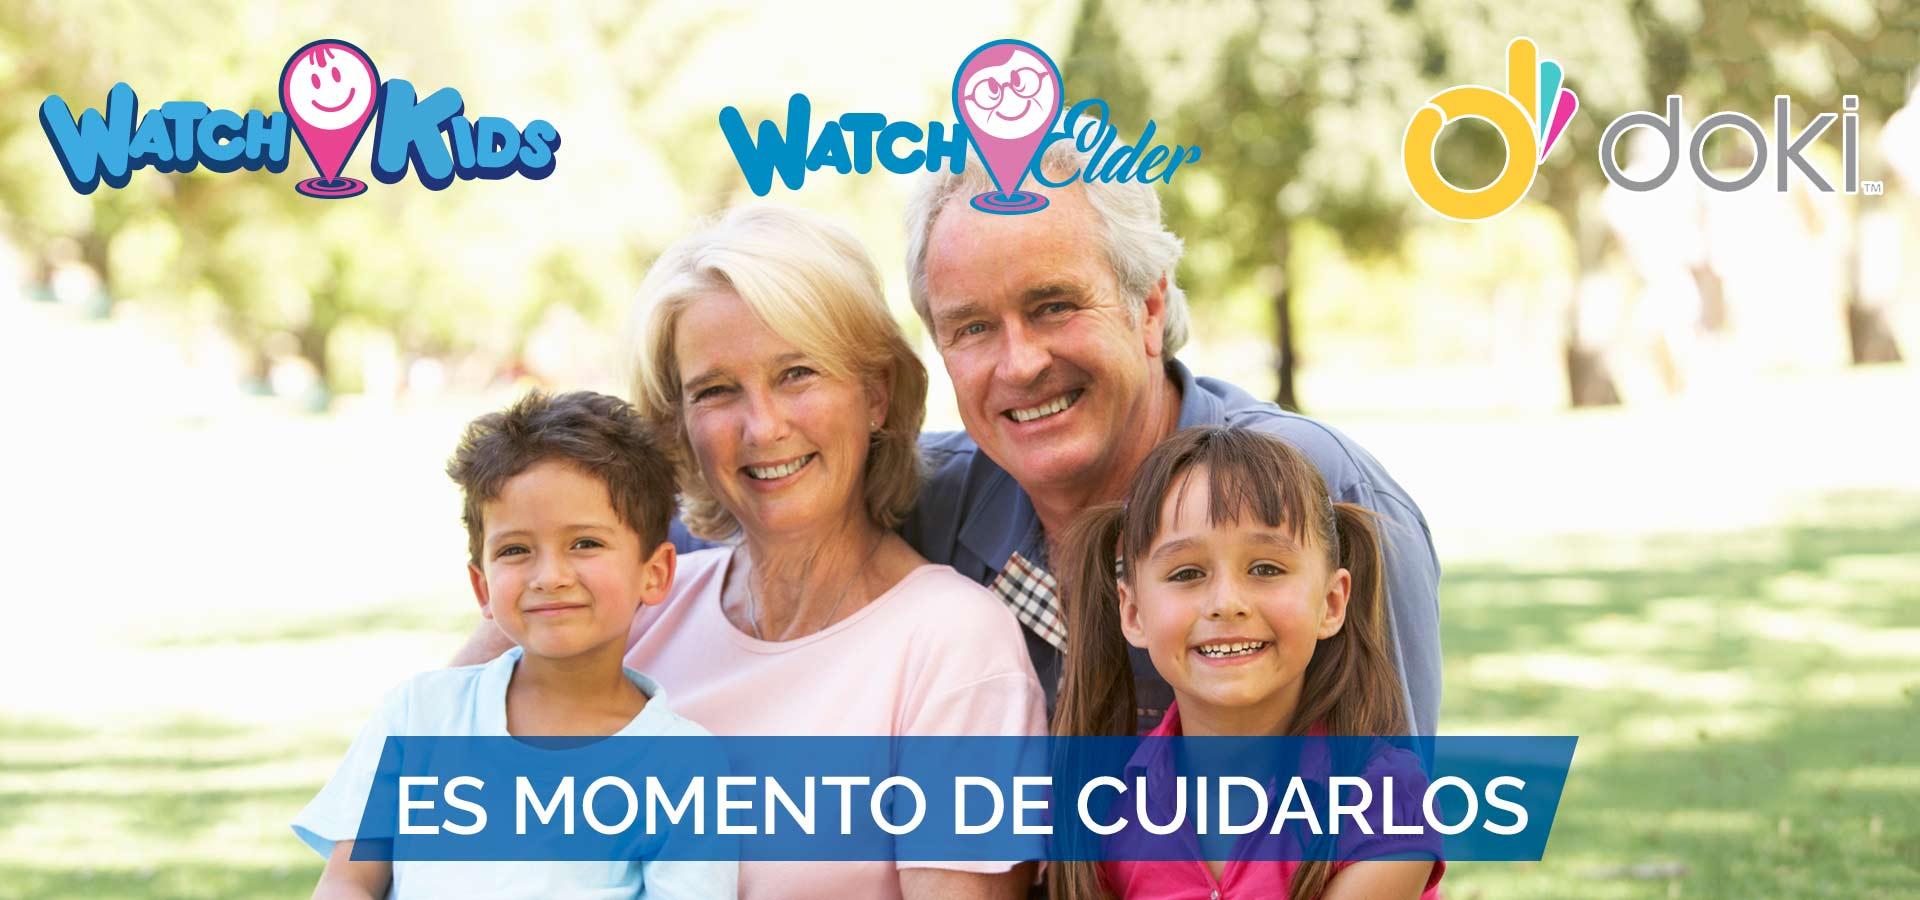 wathckids-abulosynietos-V2